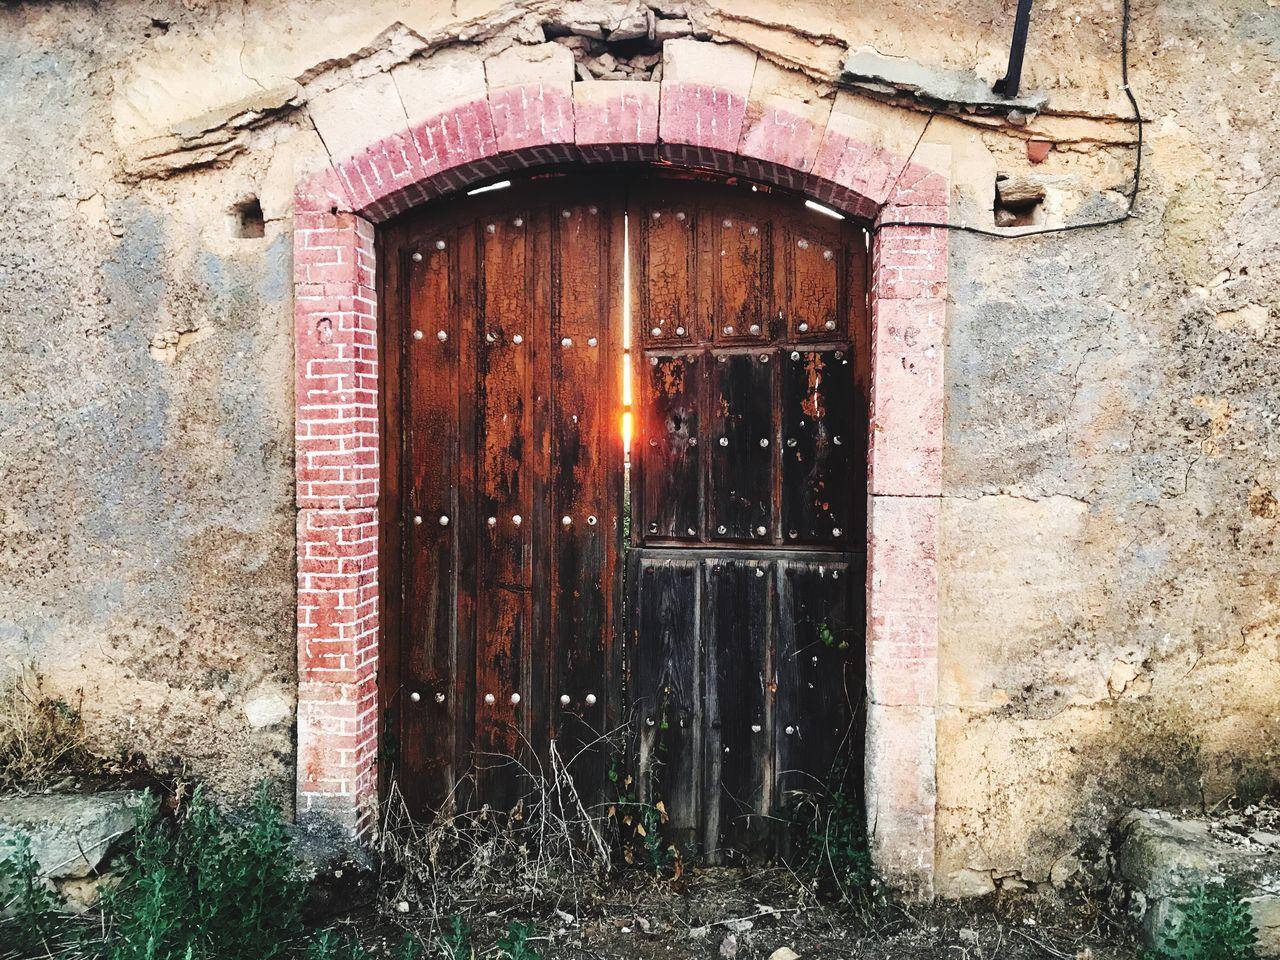 architecture, door, built structure, entrance, window, building exterior, house, damaged, no people, open door, day, outdoors